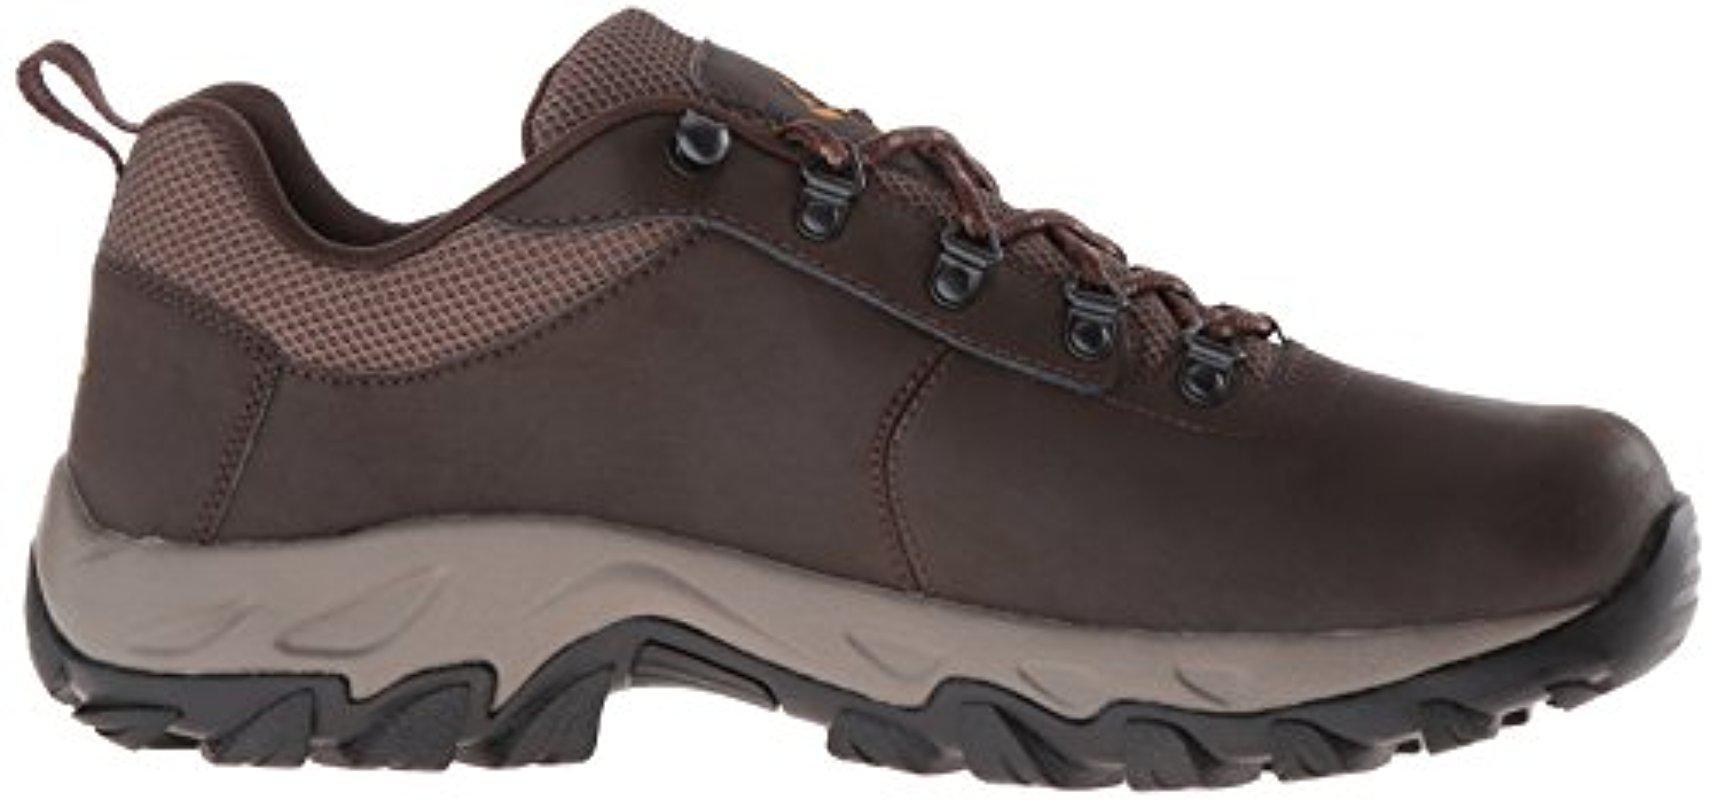 Low Waterproof Hiking Shoe for Men